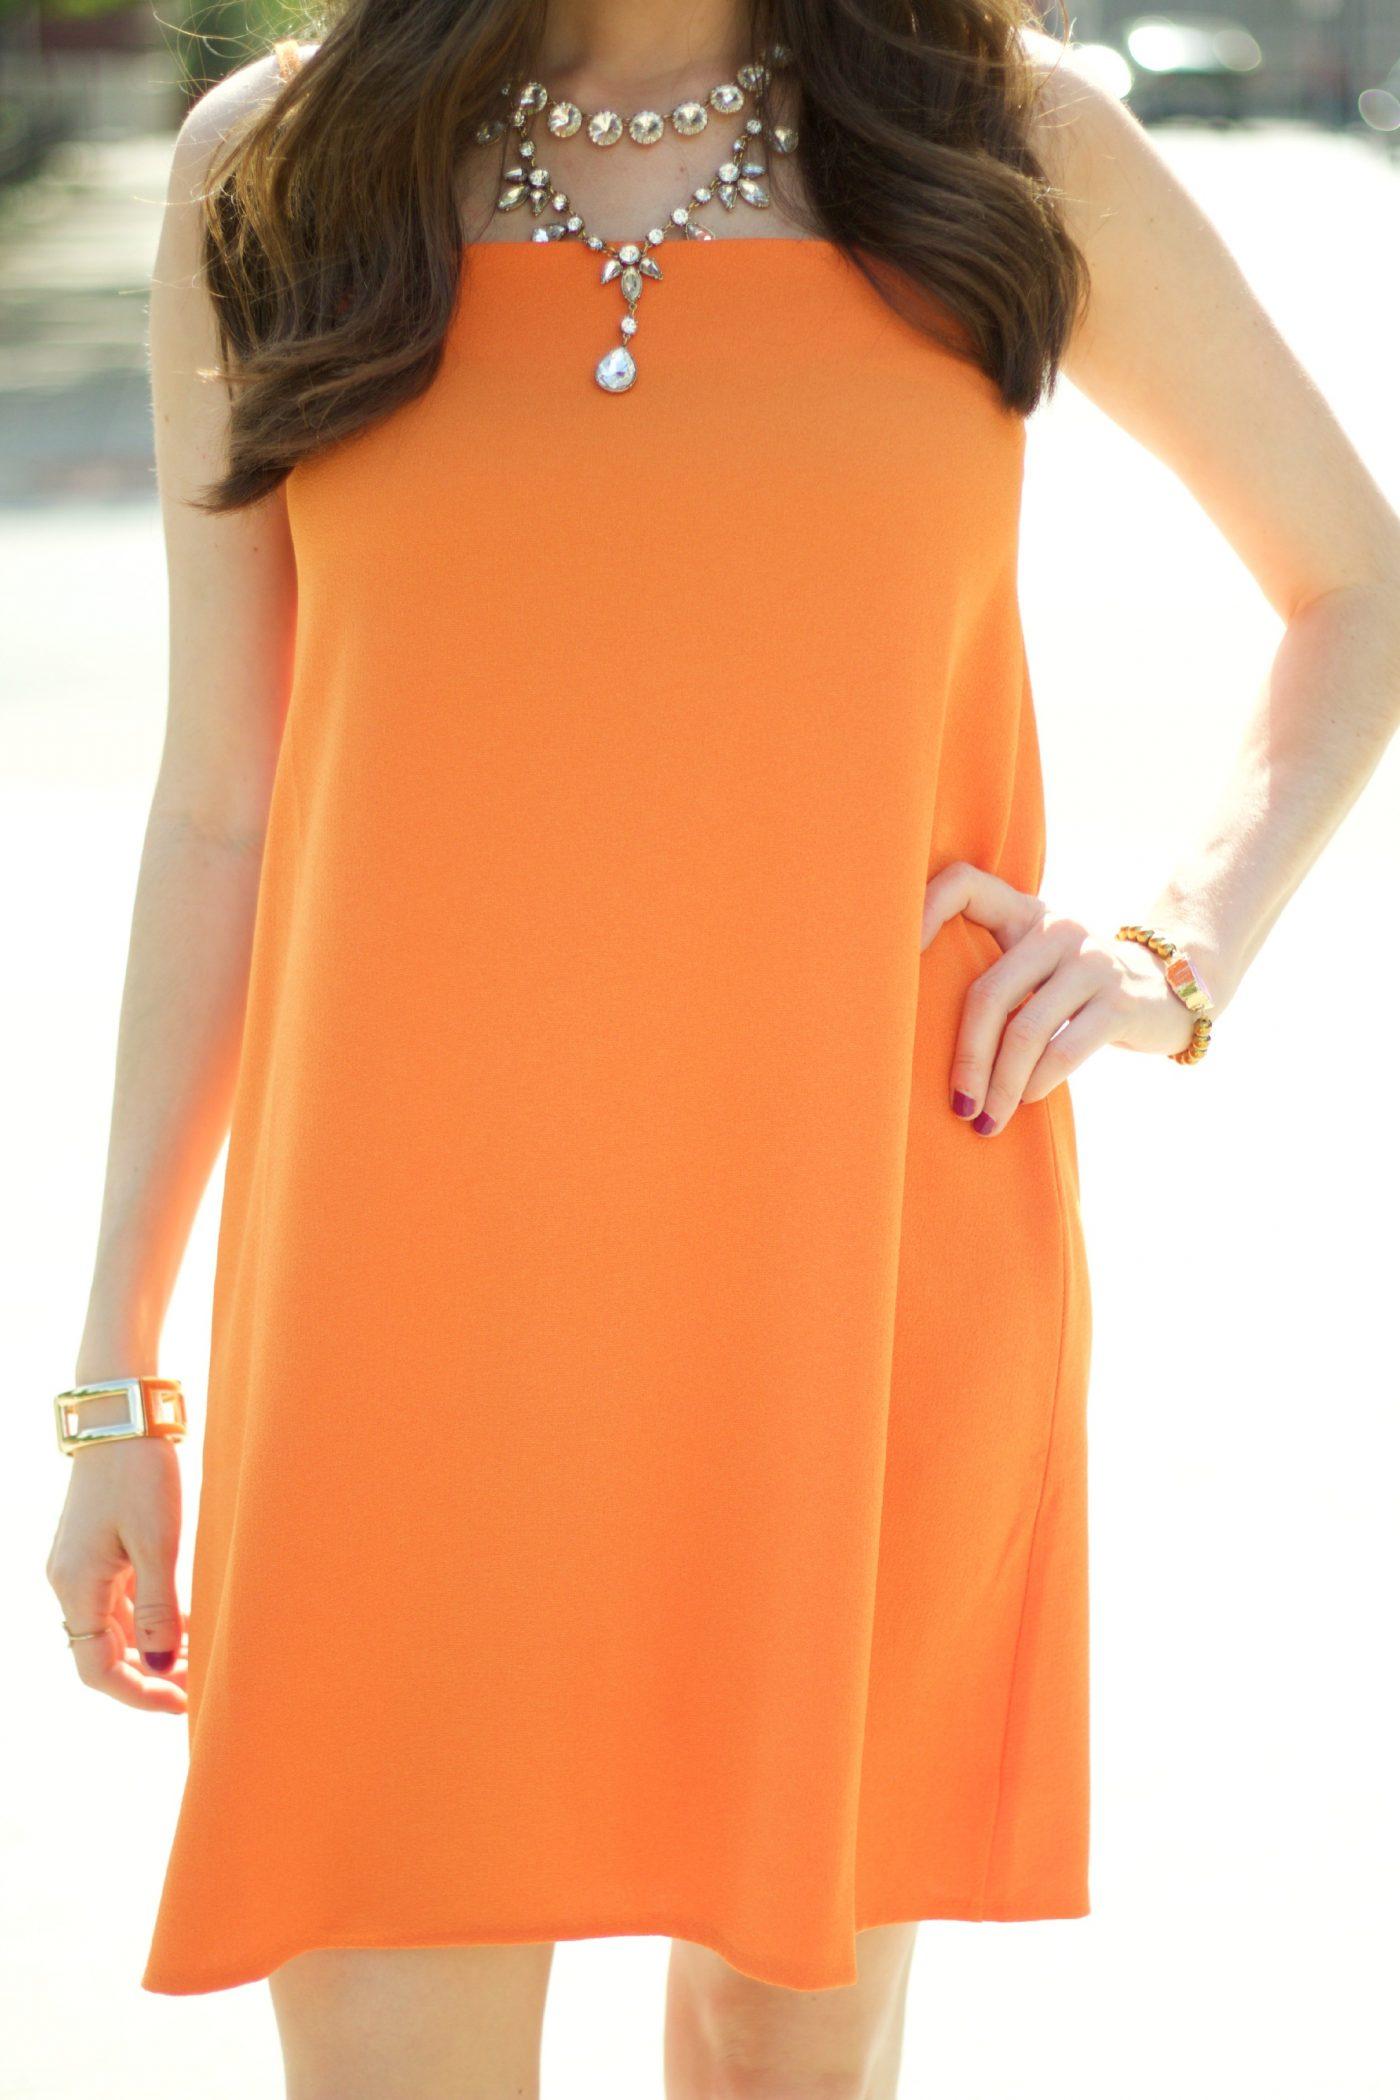 Gold Jewelry Orange Dress